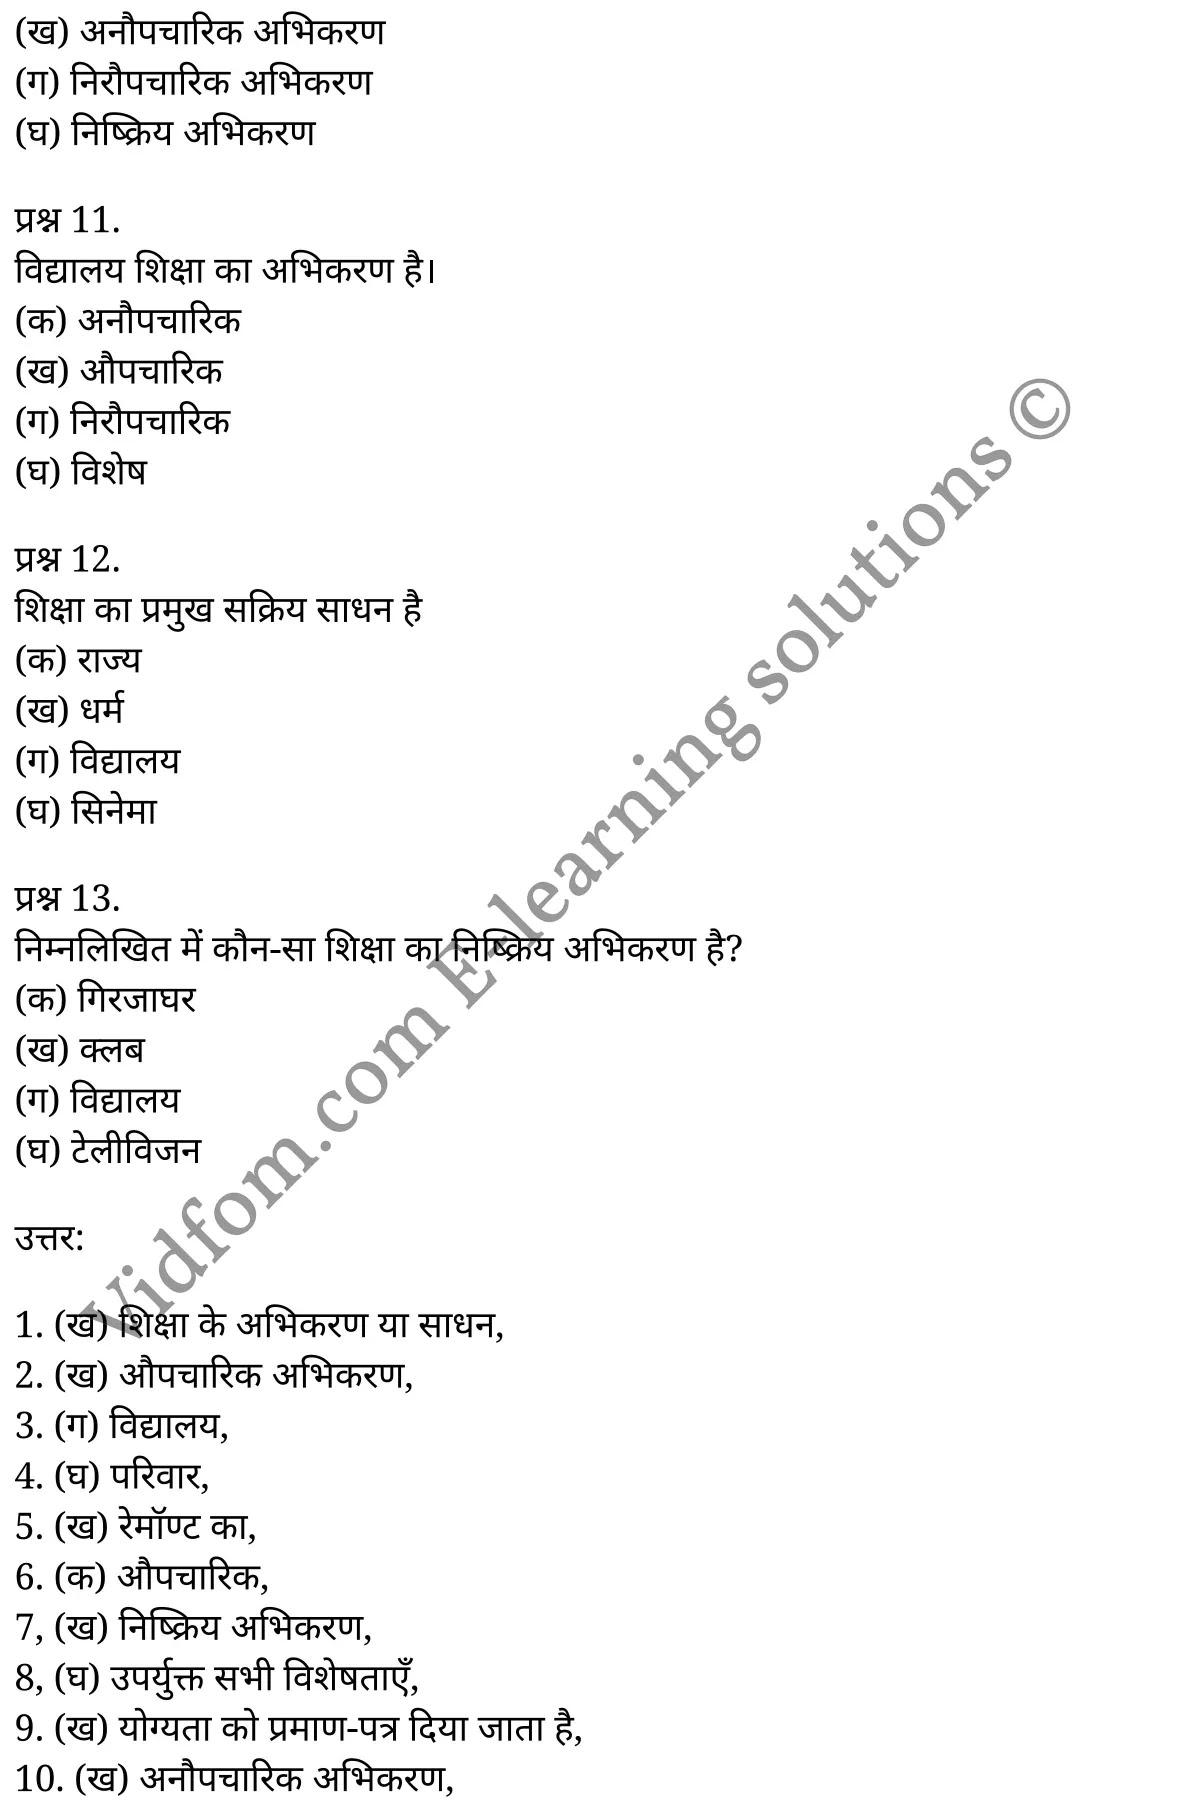 कक्षा 11 शिक्षाशास्त्र के नोट्स हिंदी में एनसीईआरटी समाधान, class 11 Pedagogy chapter 5, class 11 Pedagogy chapter 5 ncert solutions in Pedagogy, class 11 Pedagogy chapter 5 notes in hindi, class 11 Pedagogy chapter 5 question answer, class 11 Pedagogy chapter 5 notes, class 11 Pedagogy chapter 5 class 11 Pedagogy chapter 5 in hindi, class 11 Pedagogy chapter 5 important questions in hindi, class 11 Pedagogy hindi chapter 5 notes in hindi, class 11 Pedagogy chapter 5 test, class 11 Pedagogy chapter 5 class 11 Pedagogy chapter 5 pdf, class 11 Pedagogy chapter 5 notes pdf, class 11 Pedagogy chapter 5 exercise solutions, class 11 Pedagogy chapter 5, class 11 Pedagogy chapter 5 notes study rankers, class 11 Pedagogy chapter 5 notes, class 11 Pedagogy hindi chapter 5 notes, class 11 Pedagogy chapter 5 class 11 notes pdf, class 11 Pedagogy chapter 5 class 11 notes ncert, class 11 Pedagogy chapter 5 class 11 pdf, class 11 Pedagogy chapter 5 book, class 11 Pedagogy chapter 5 quiz class 11 , 11 th class 11 Pedagogy chapter 5 book up board, up board 11 th class 11 Pedagogy chapter 5 notes, class 11 Pedagogy, class 11 Pedagogy ncert solutions in Pedagogy, class 11 Pedagogy notes in hindi, class 11 Pedagogy question answer, class 11 Pedagogy notes, class 11 Pedagogy class 11 Pedagogy chapter 5 in hindi, class 11 Pedagogy important questions in hindi, class 11 Pedagogy notes in hindi, class 11 Pedagogy test, class 11 Pedagogy class 11 Pedagogy chapter 5 pdf, class 11 Pedagogy notes pdf, class 11 Pedagogy exercise solutions, class 11 Pedagogy, class 11 Pedagogy notes study rankers, class 11 Pedagogy notes, class 11 Pedagogy notes, class 11 Pedagogy class 11 notes pdf, class 11 Pedagogy class 11 notes ncert, class 11 Pedagogy class 11 pdf, class 11 Pedagogy book, class 11 Pedagogy quiz class 11 , 11 th class 11 Pedagogy book up board, up board 11 th class 11 Pedagogy notes, कक्षा 11 शिक्षाशास्त्र अध्याय 5 , कक्षा 11 शिक्षाशास्त्र, कक्षा 11 शिक्षाशास्त्र अध्याय 5 के नोट्स हिंदी में